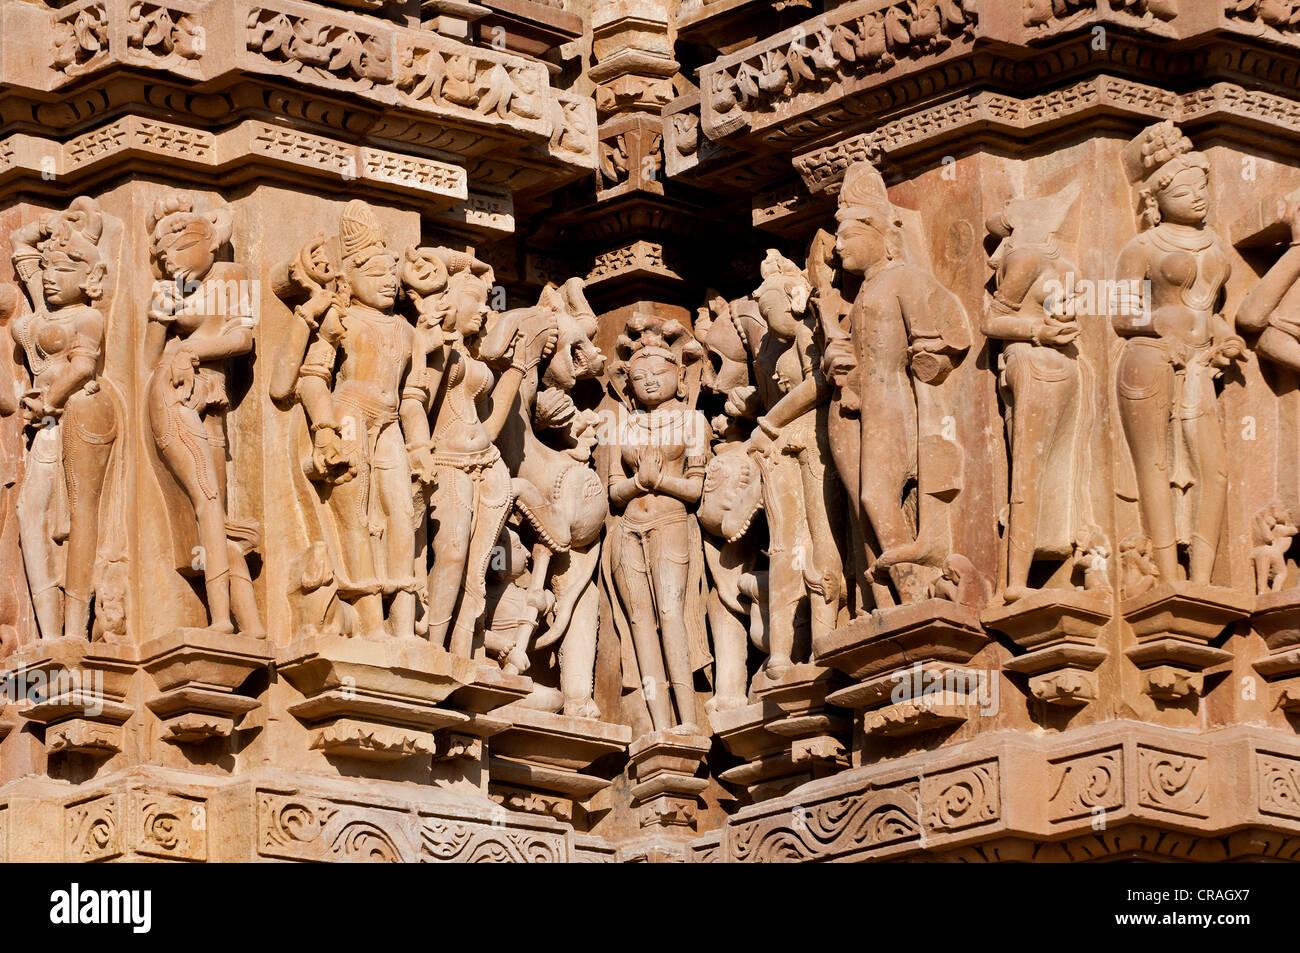 Decorative sculptures, Hindu deities, Khajuraho Group of Monuments, UNESCO World Heritage Site, Madhya Pradesh, Stock Photo